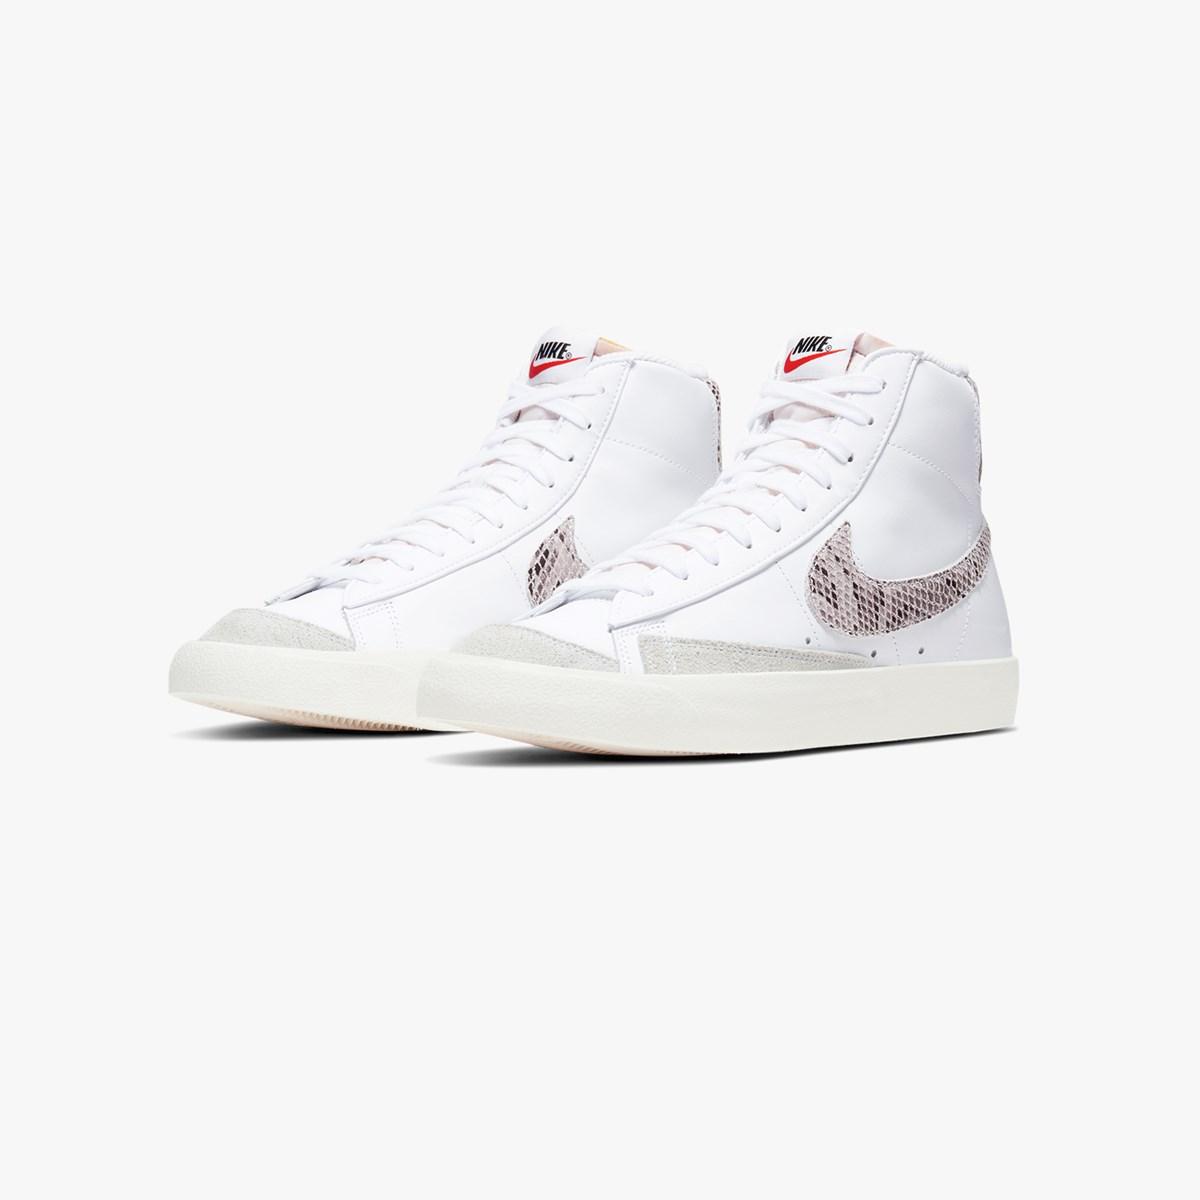 Nike Blazer Mid 77 VNTG Reptile - Ci1176-101 - SNS   sneakers & streetwear online since 1999